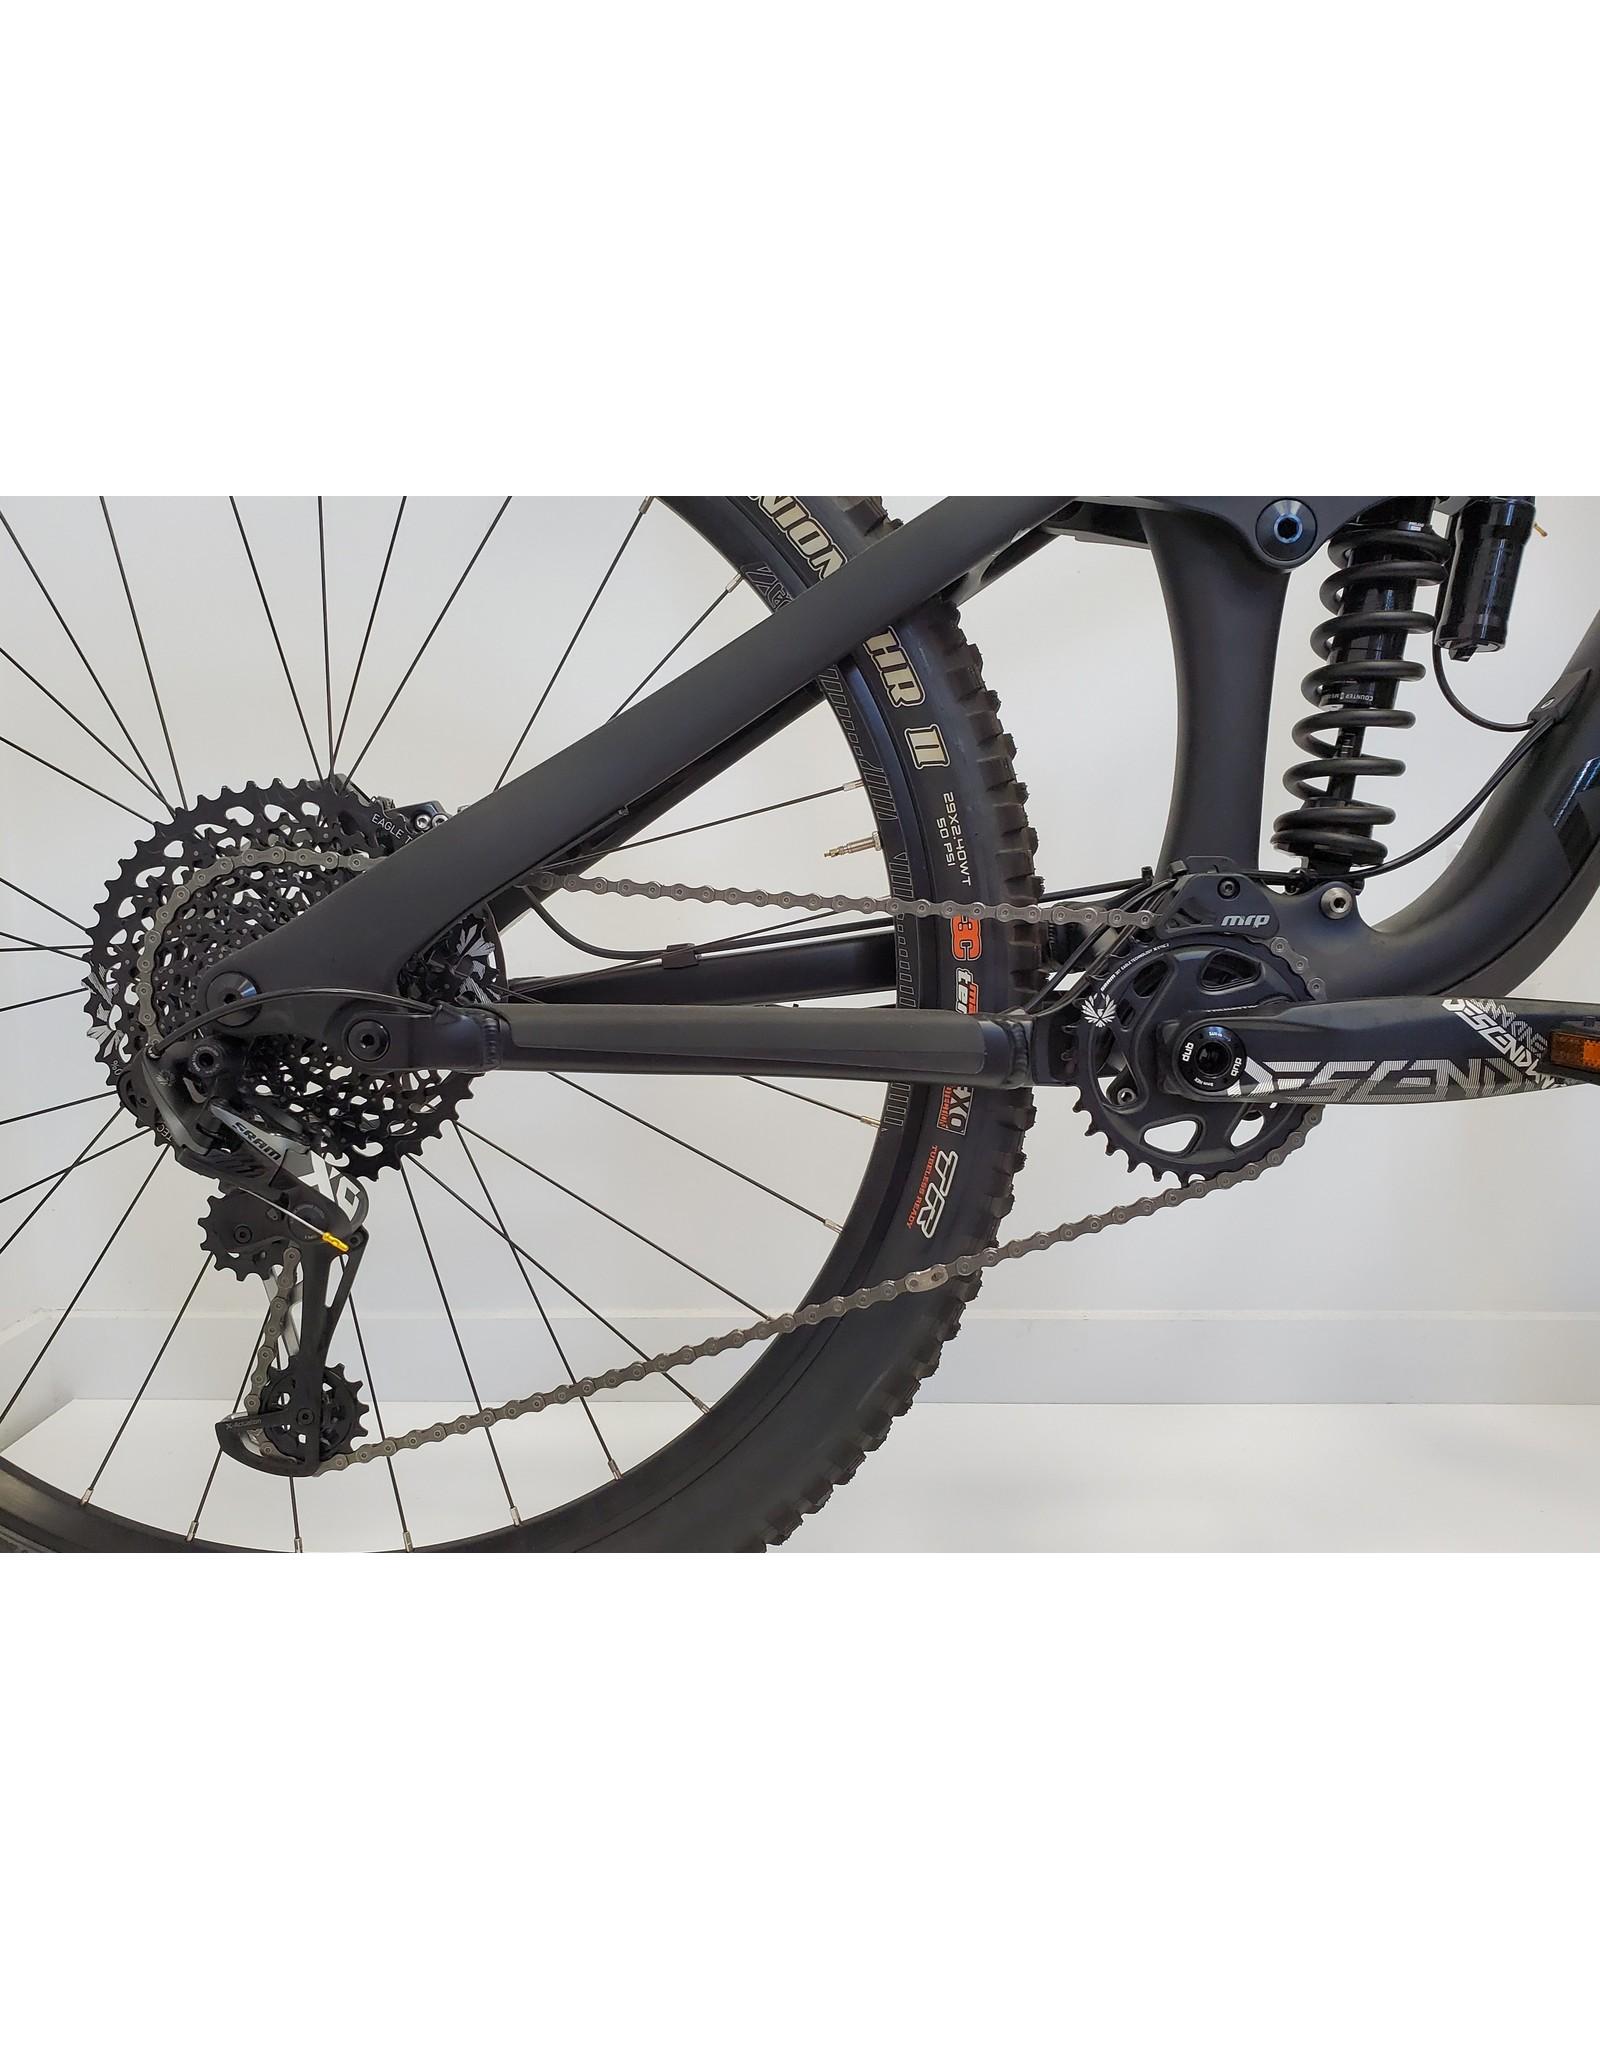 TREK 2019 Range C3 - Custom Build - Large